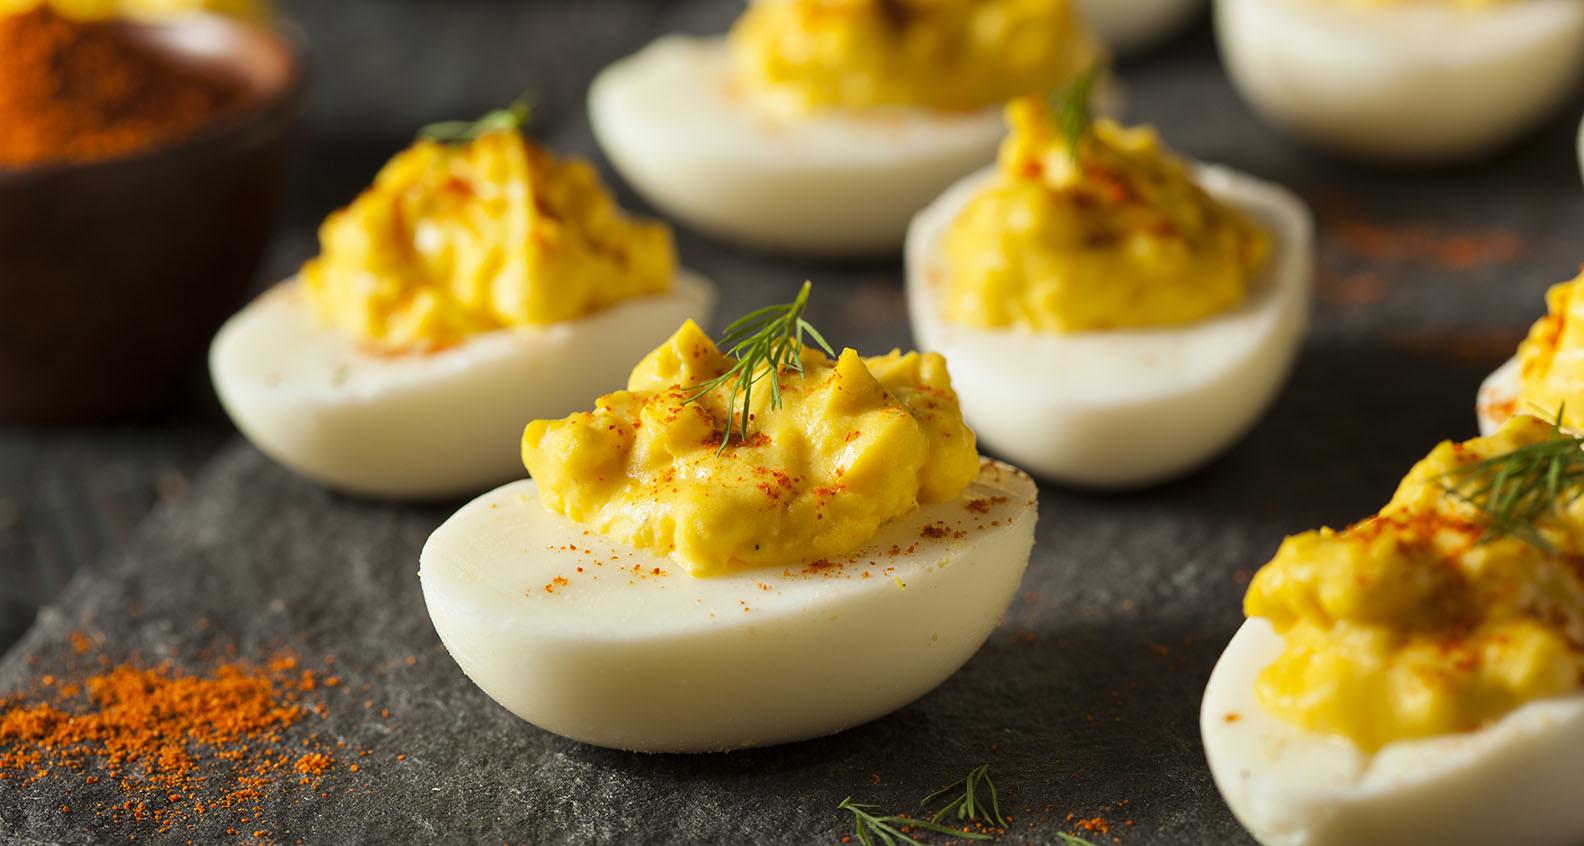 Deviled eggs 5ways hero